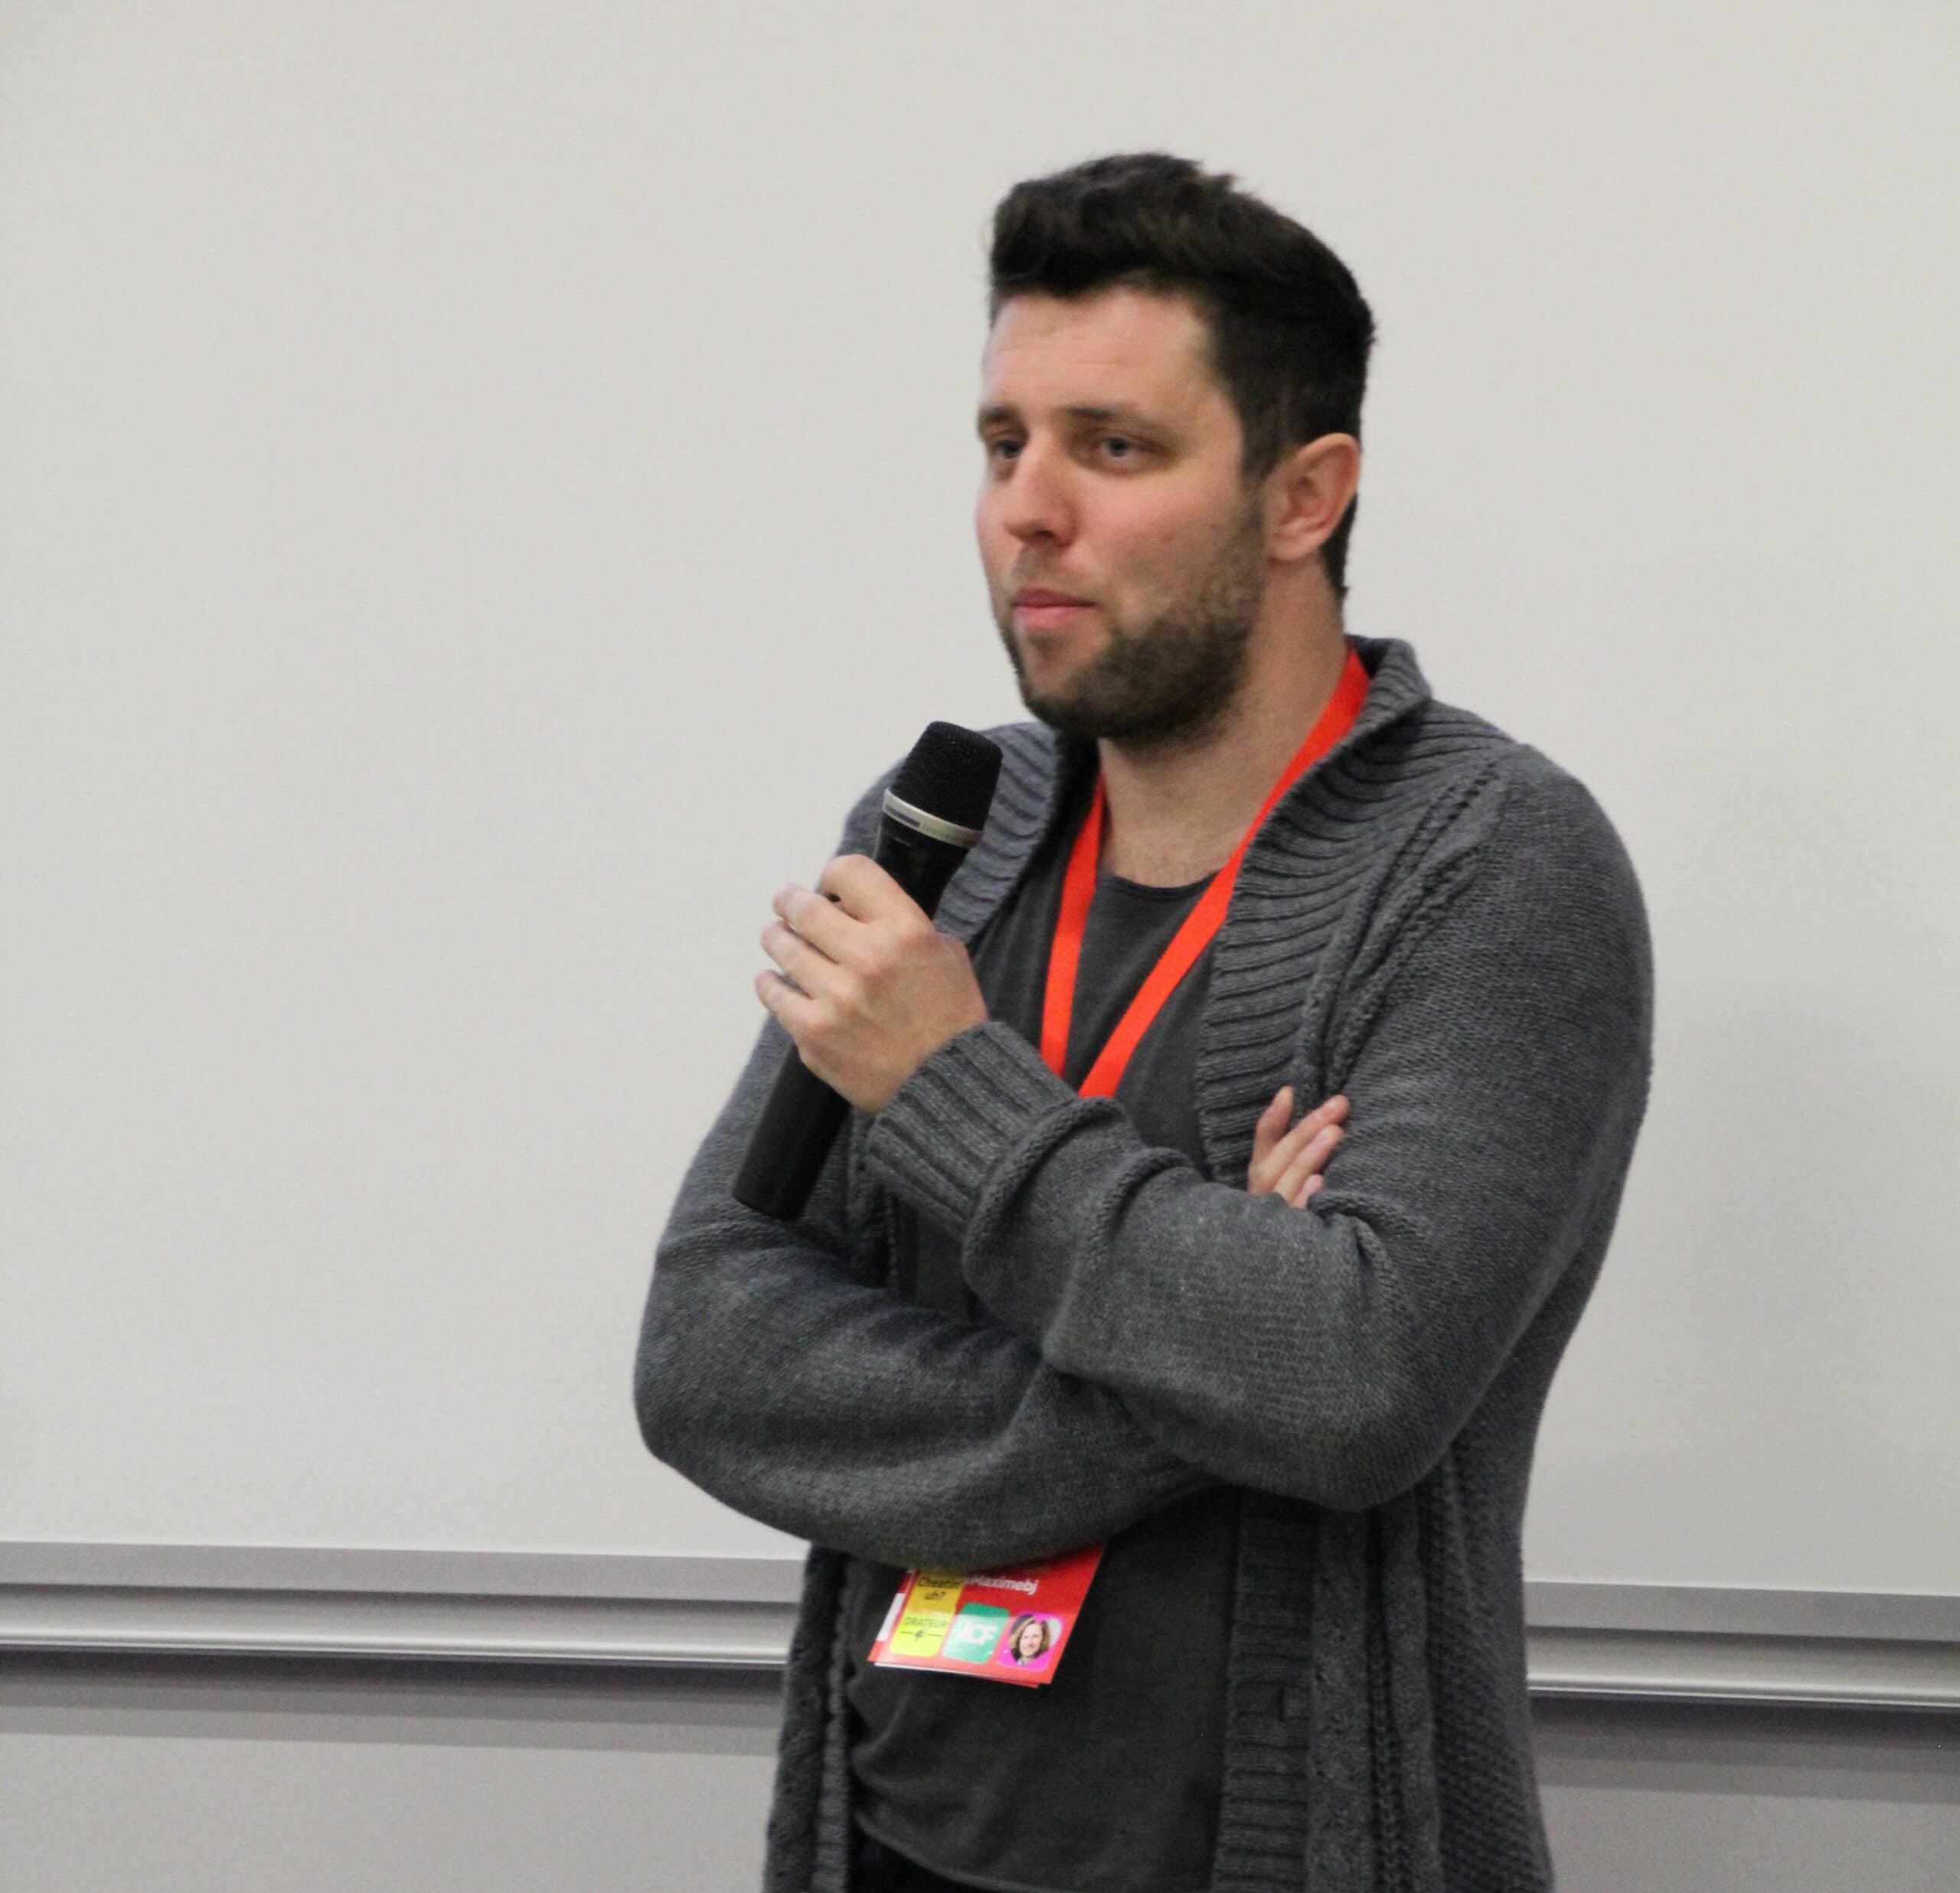 Maxime Bernard Jacquet on discovering the REST API